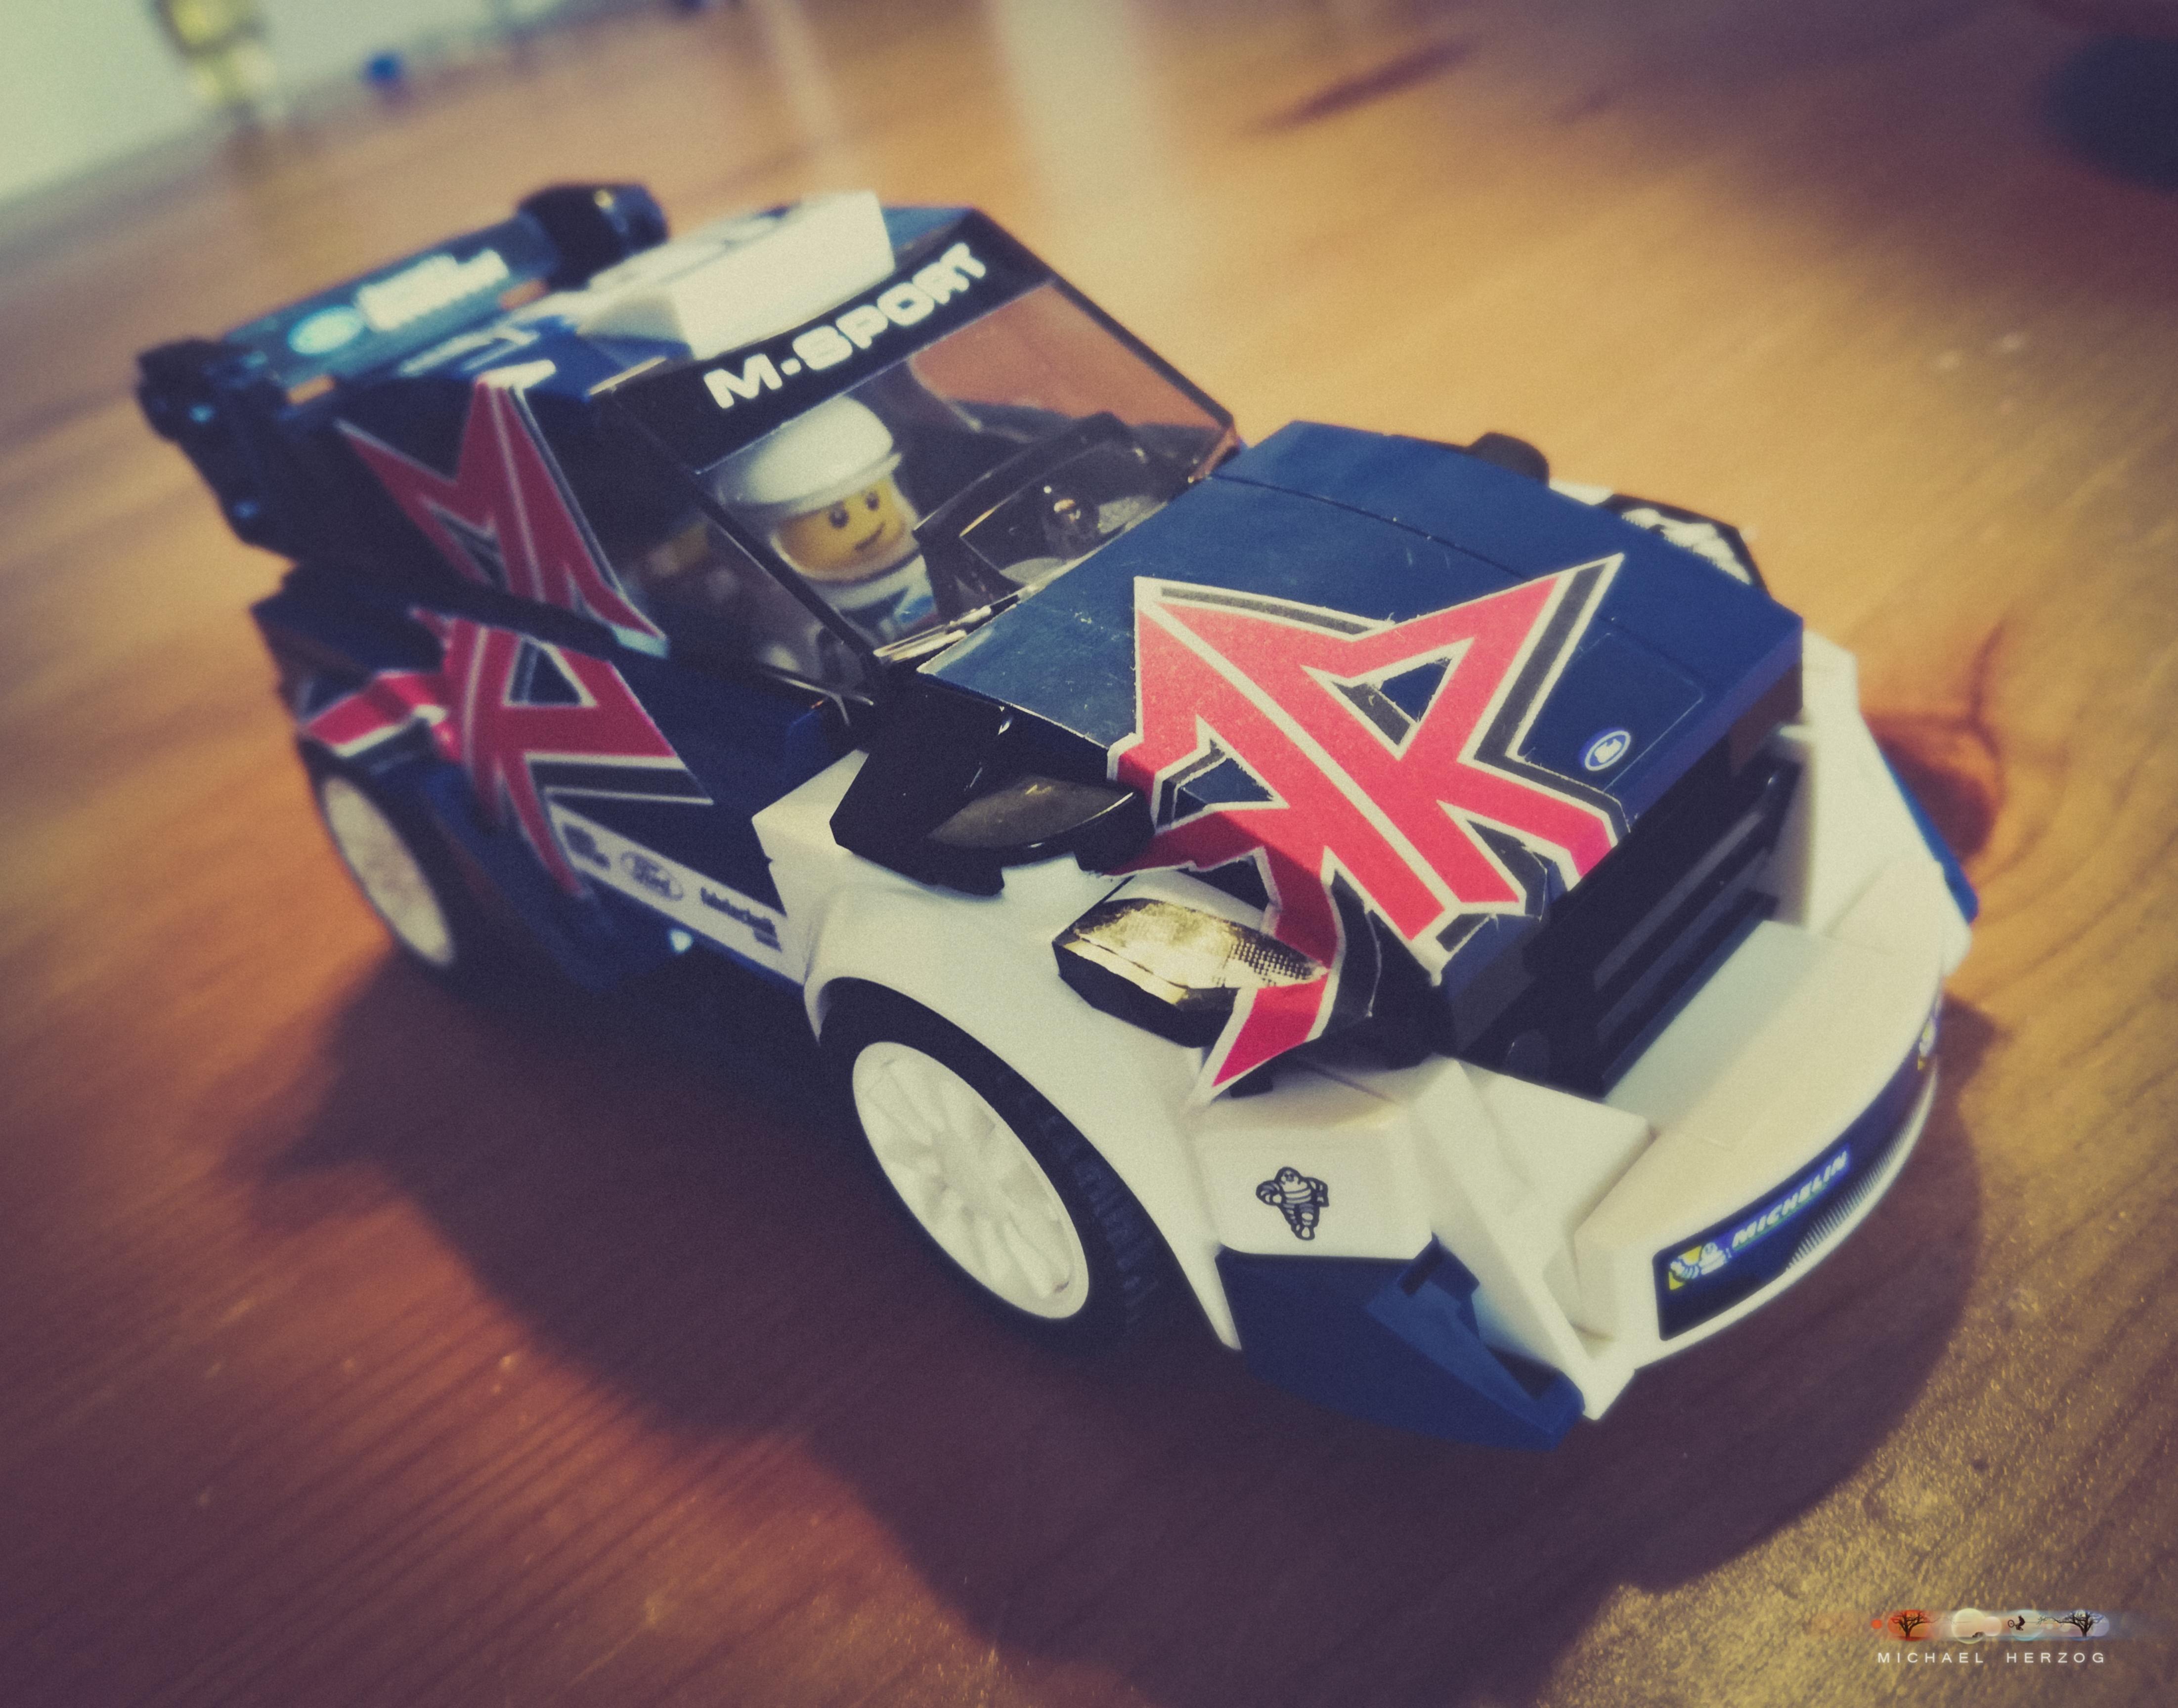 RacingRookie2019_Lego-Ford-Fiesta_Speedchampion_RookieEdition_AUTrenalinStudios-01.jpg